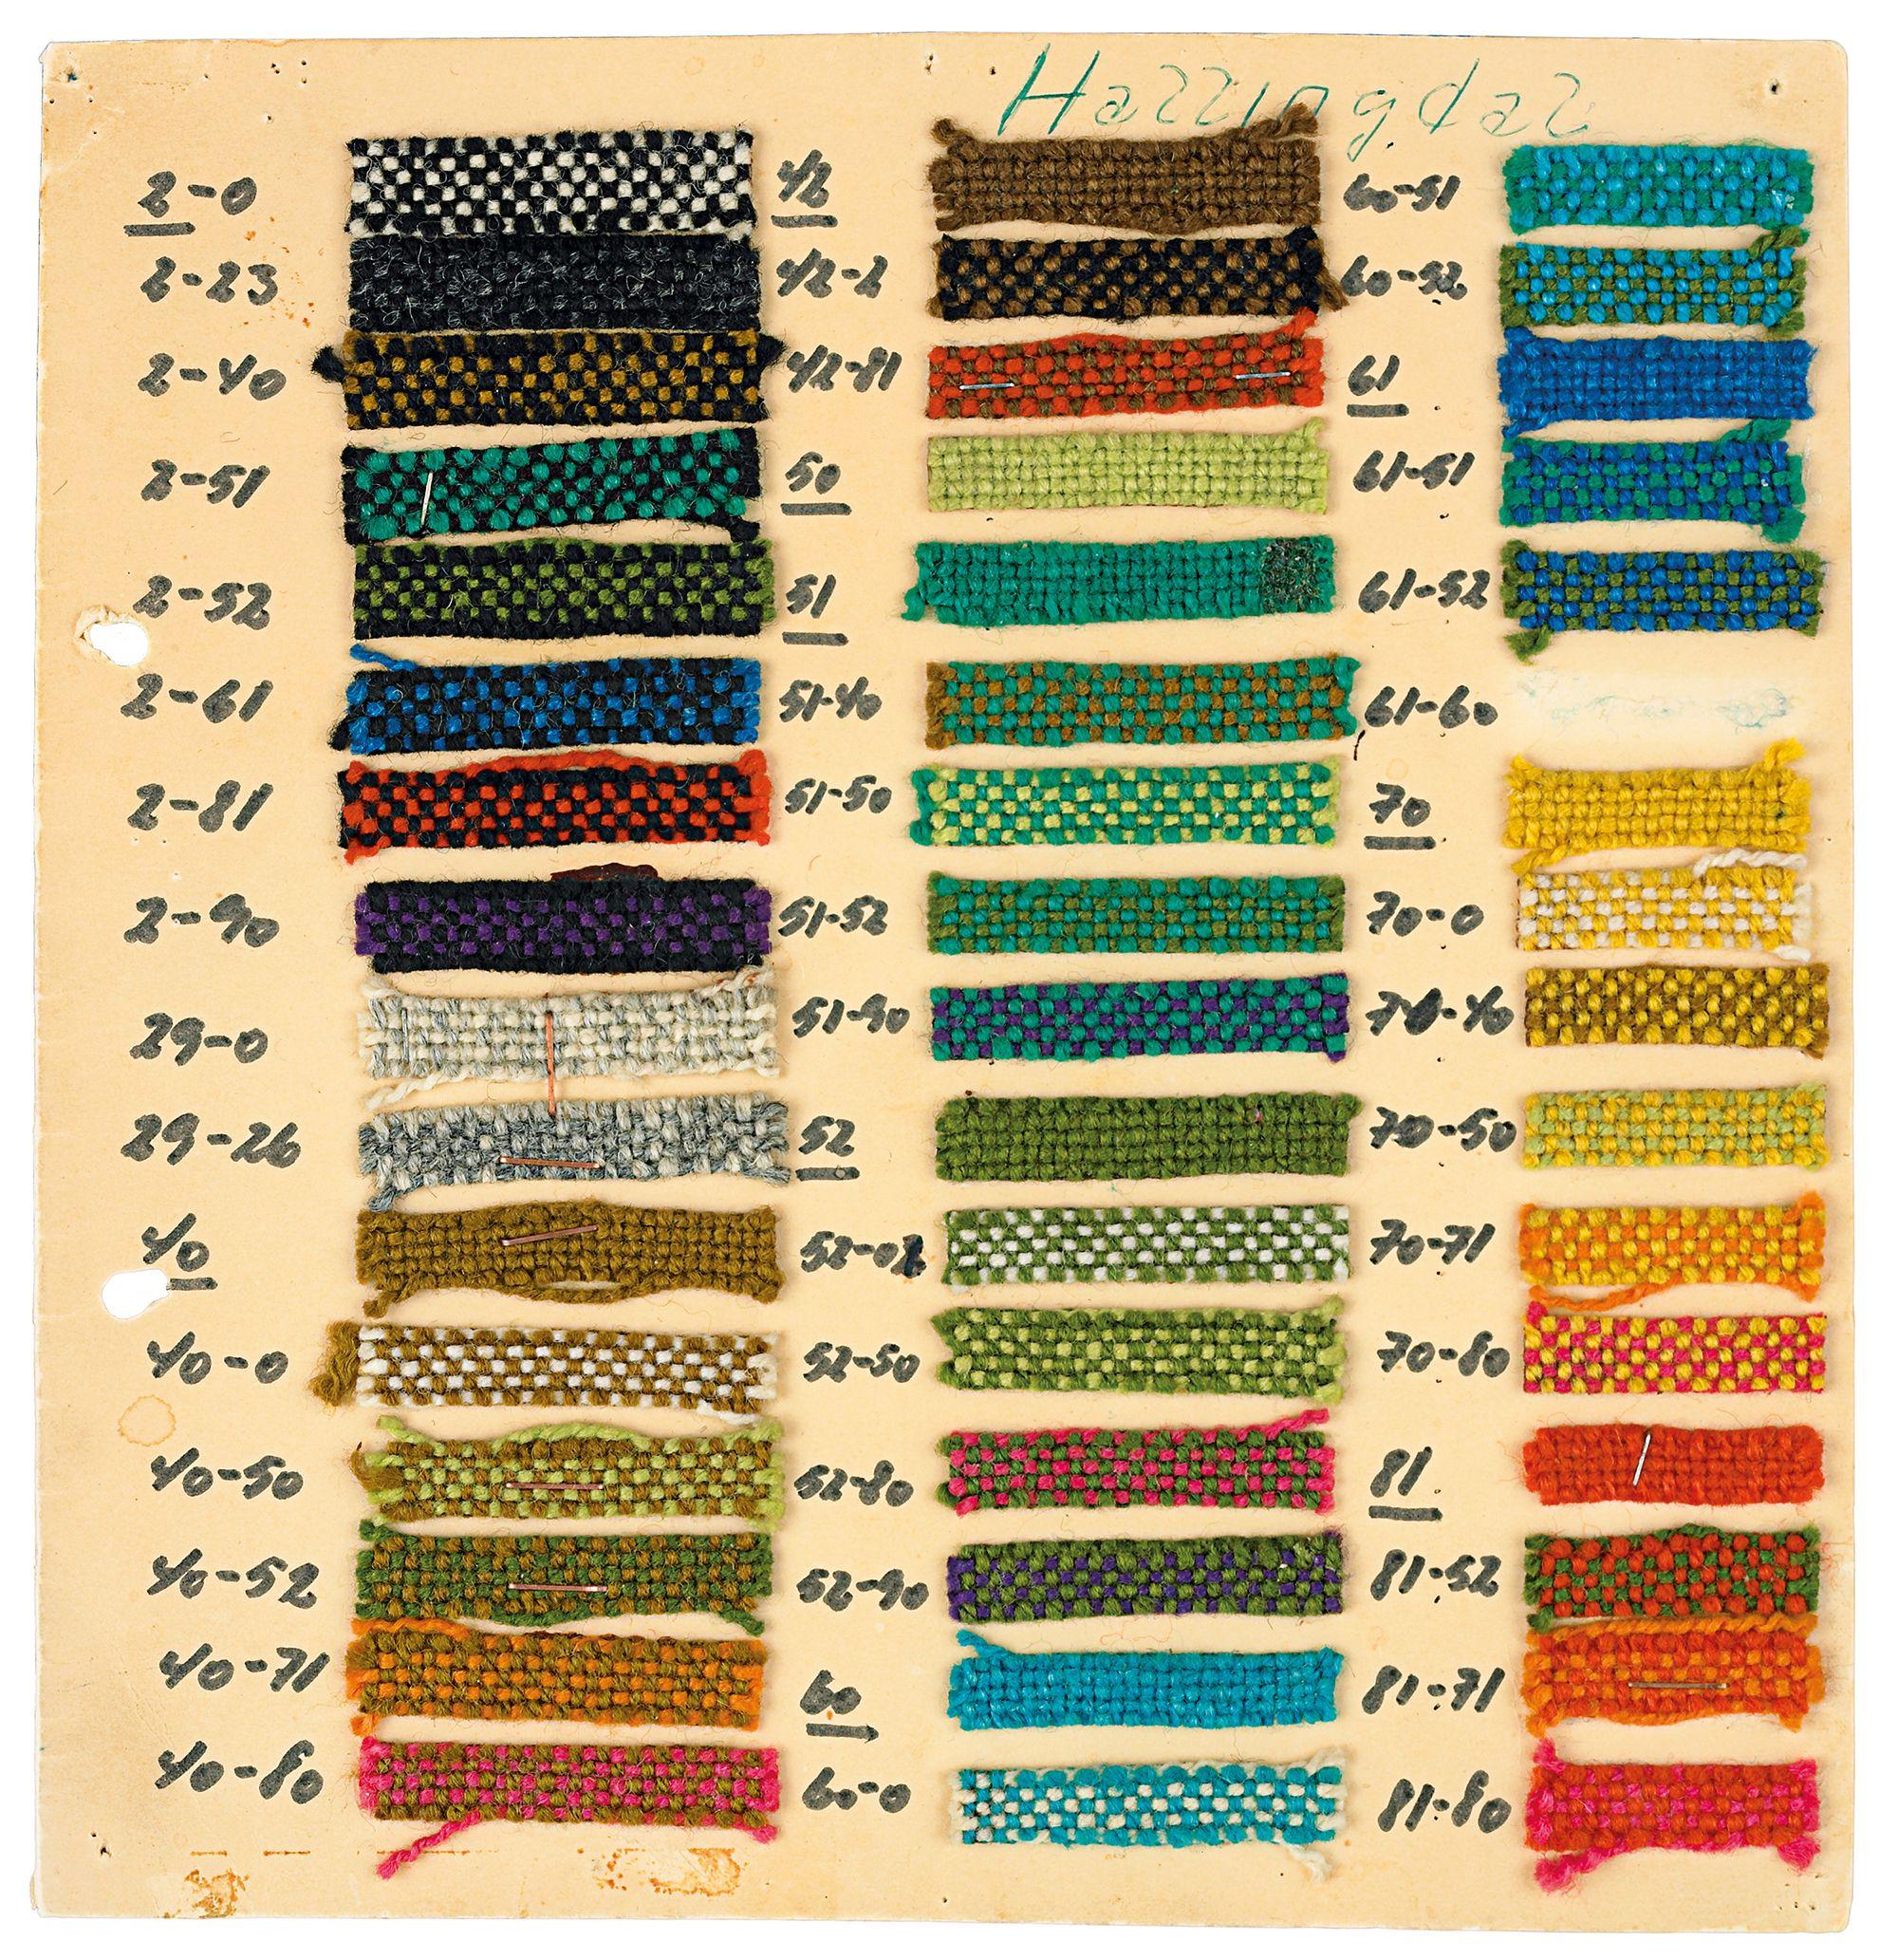 Hallingdal colour sample proposal